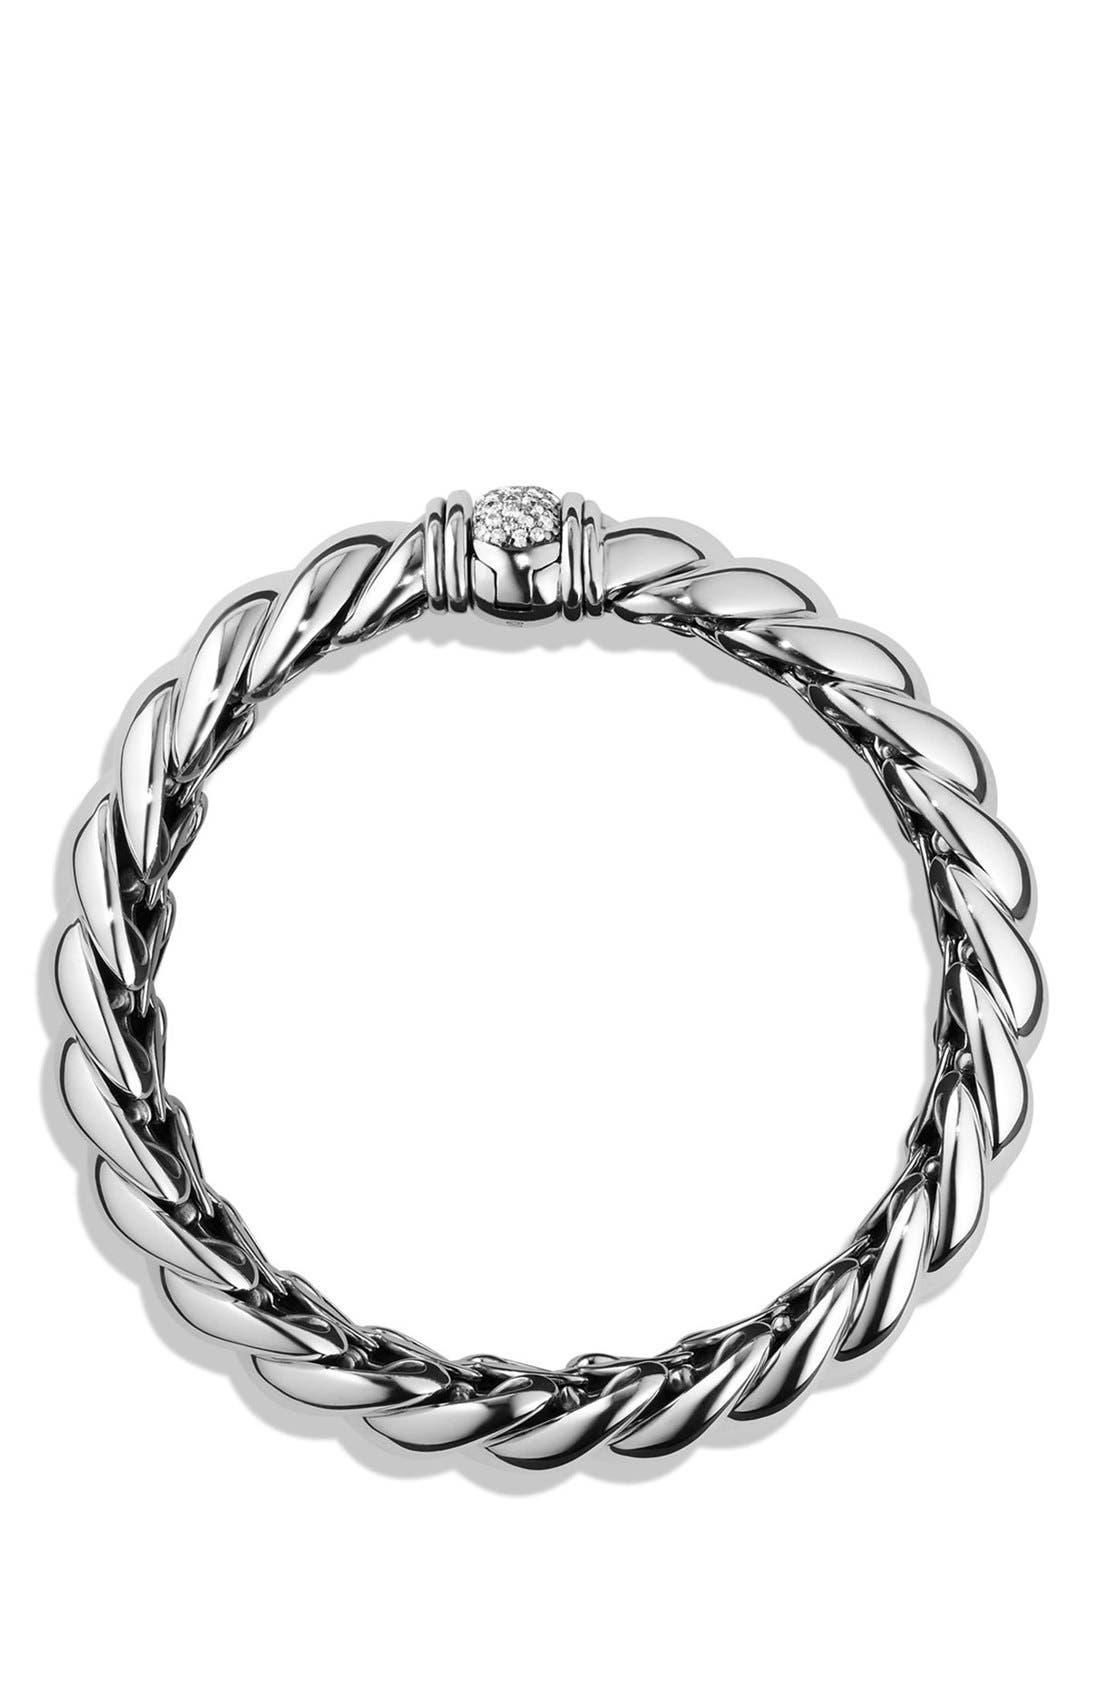 DAVID YURMAN 'Hampton' Bracelet with Diamonds